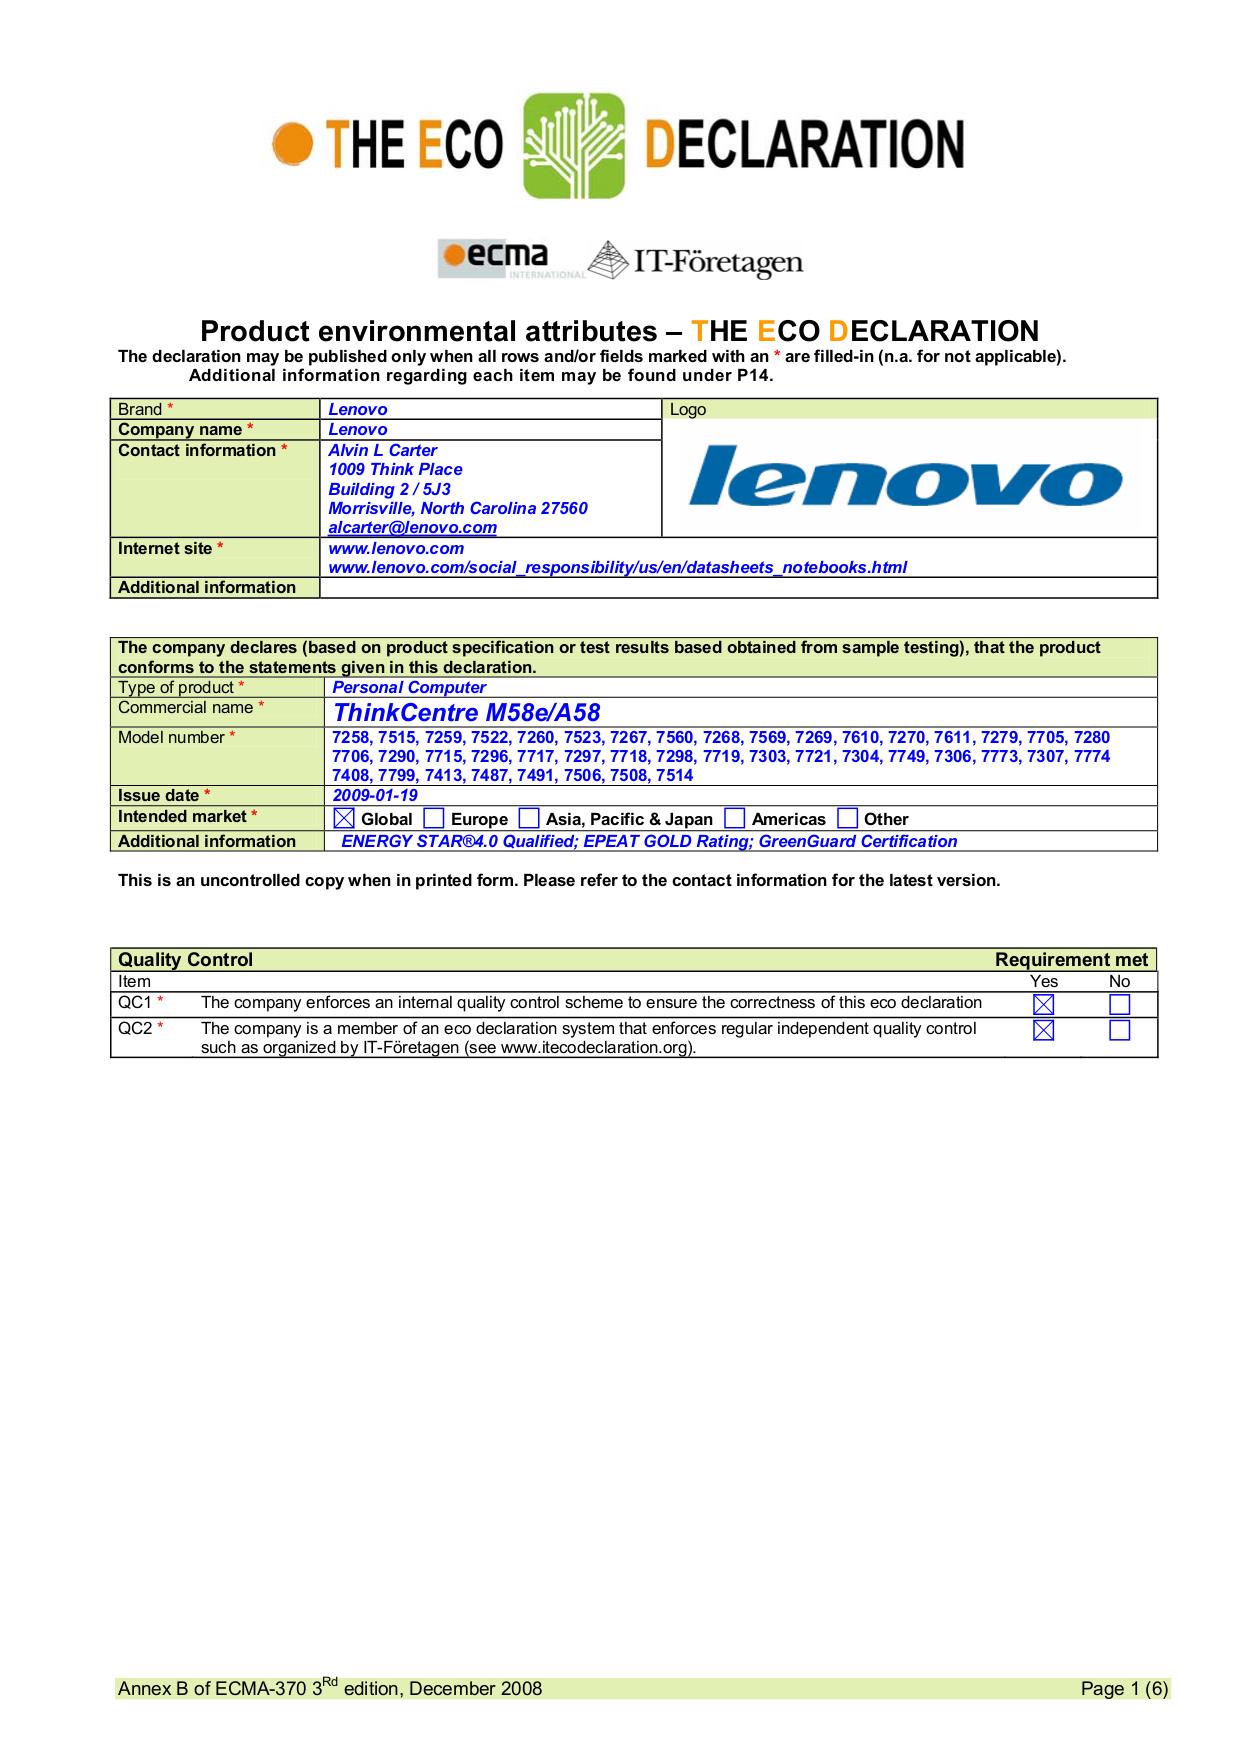 pdf for Lenovo Desktop ThinkCentre A58 7773 manual